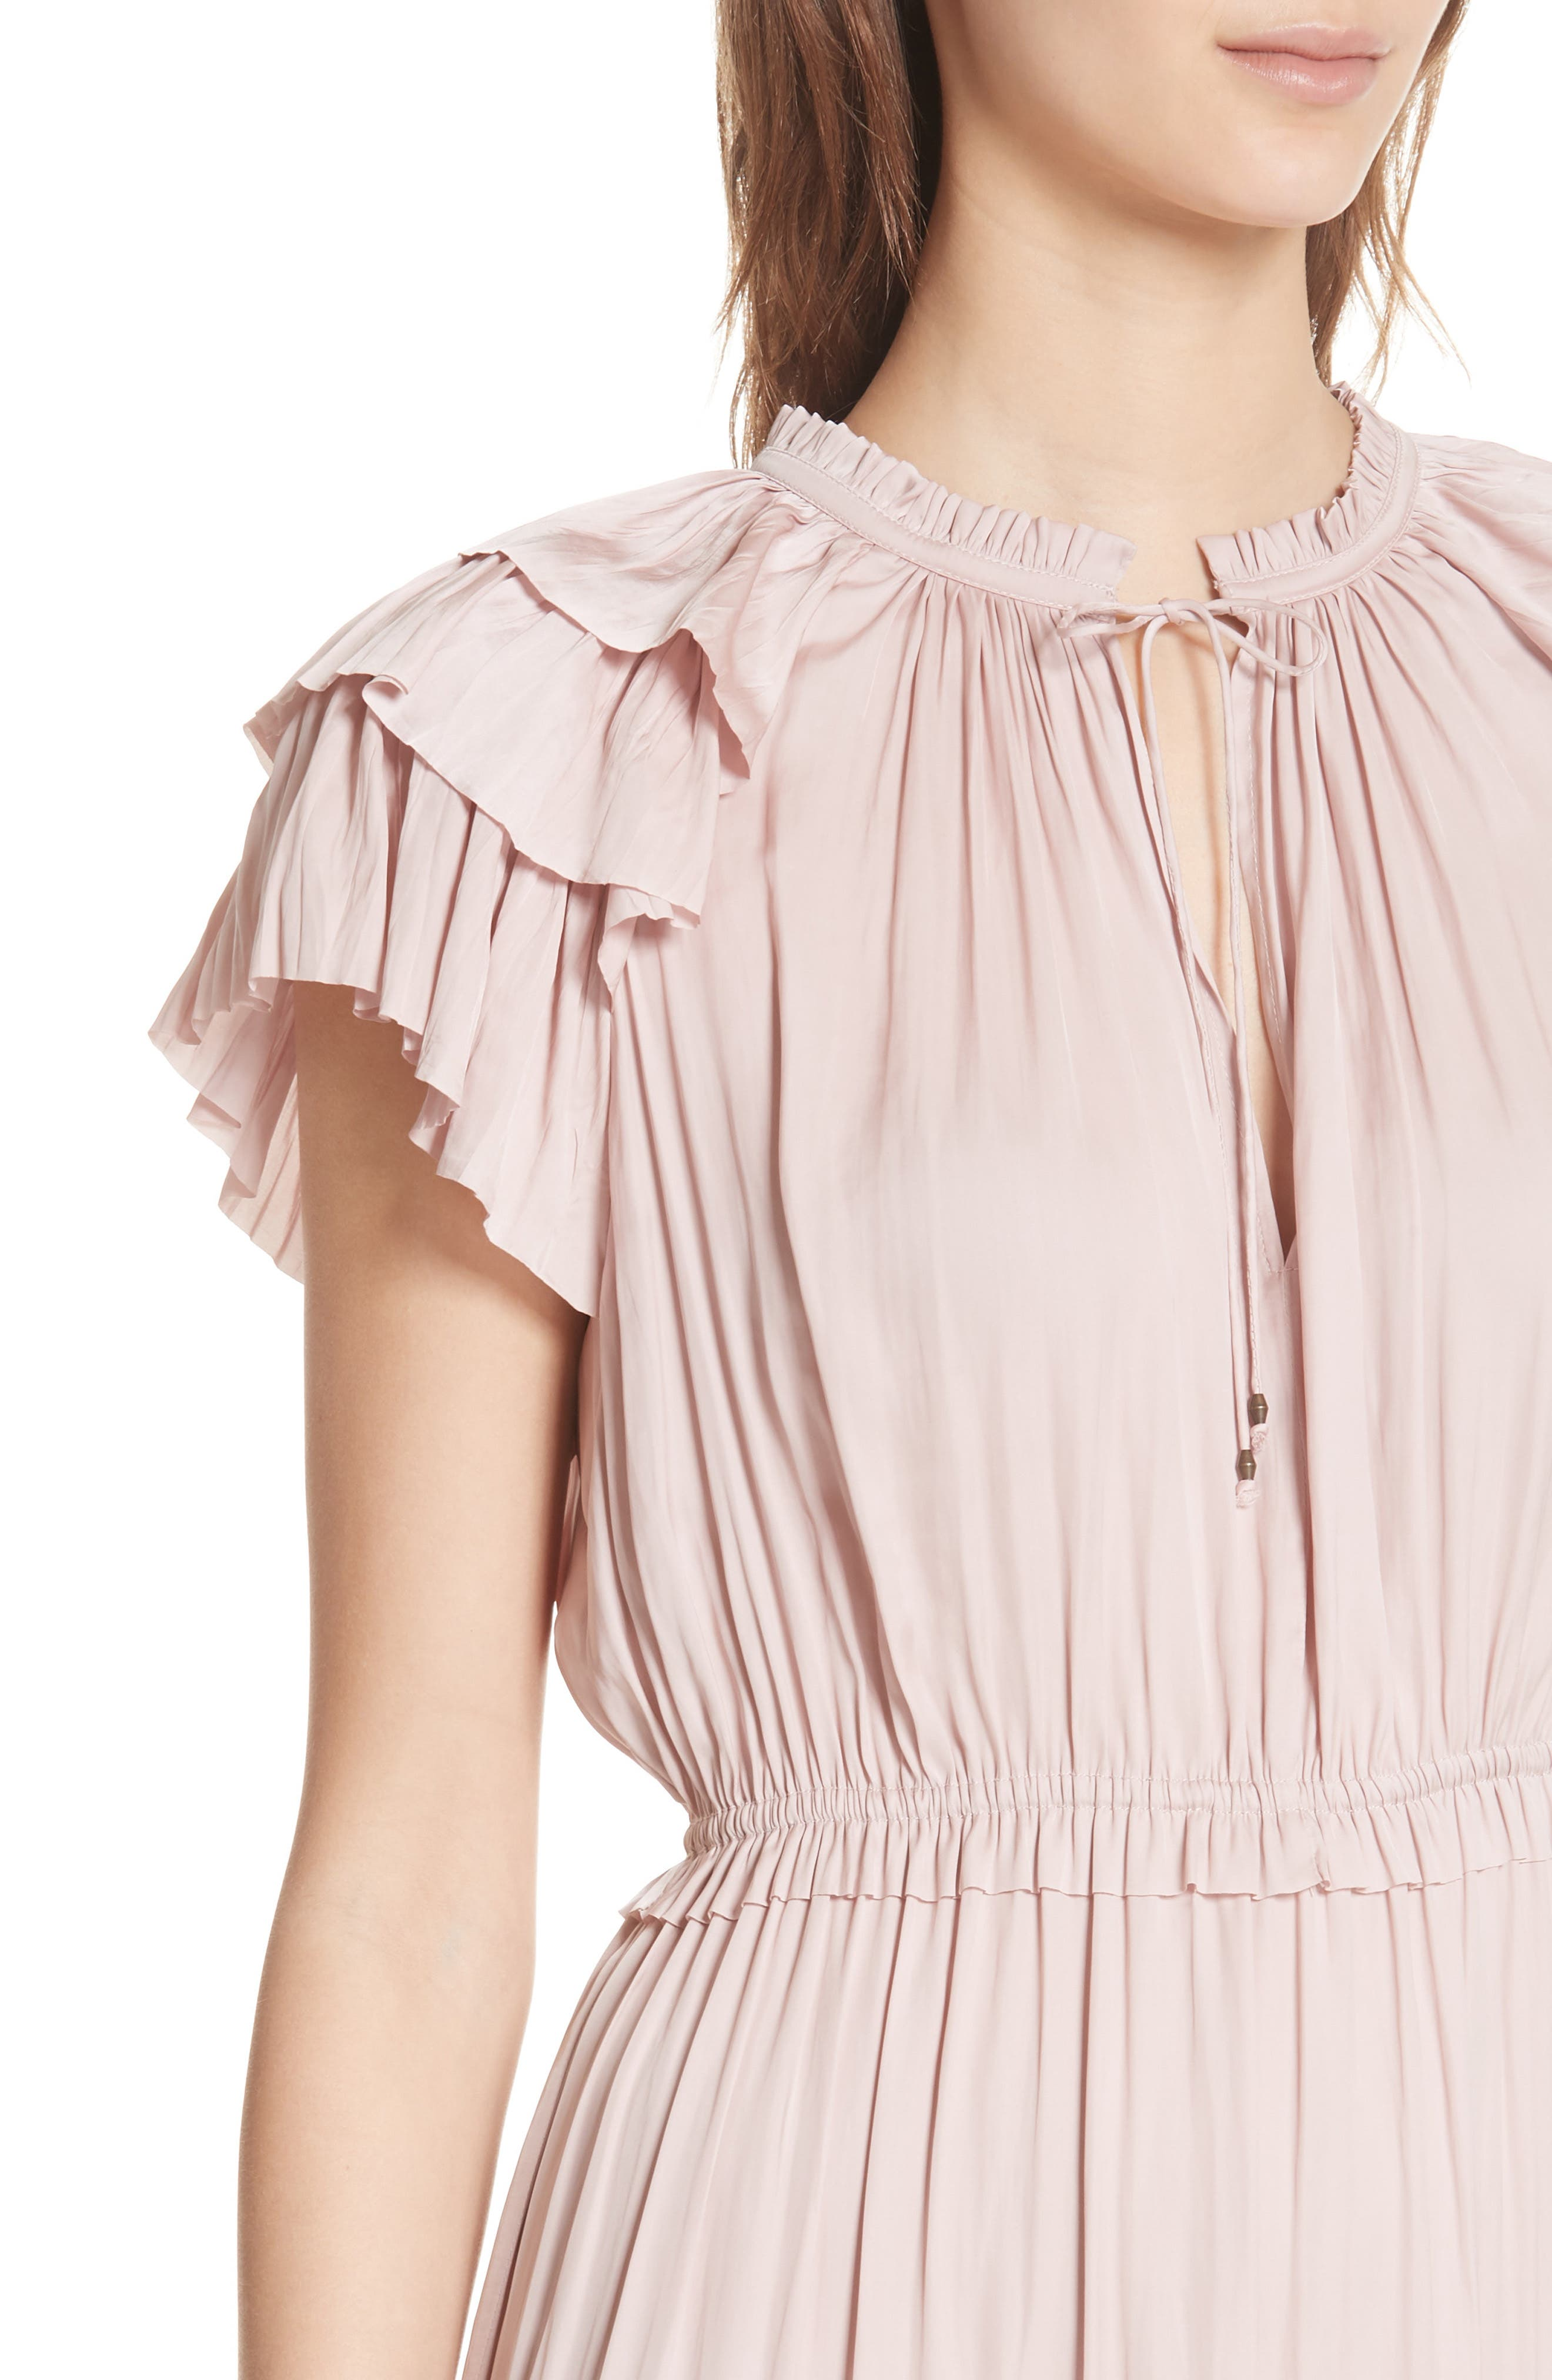 ULLA JOHNSON,                             Blaire Satin Dress,                             Alternate thumbnail 4, color,                             600